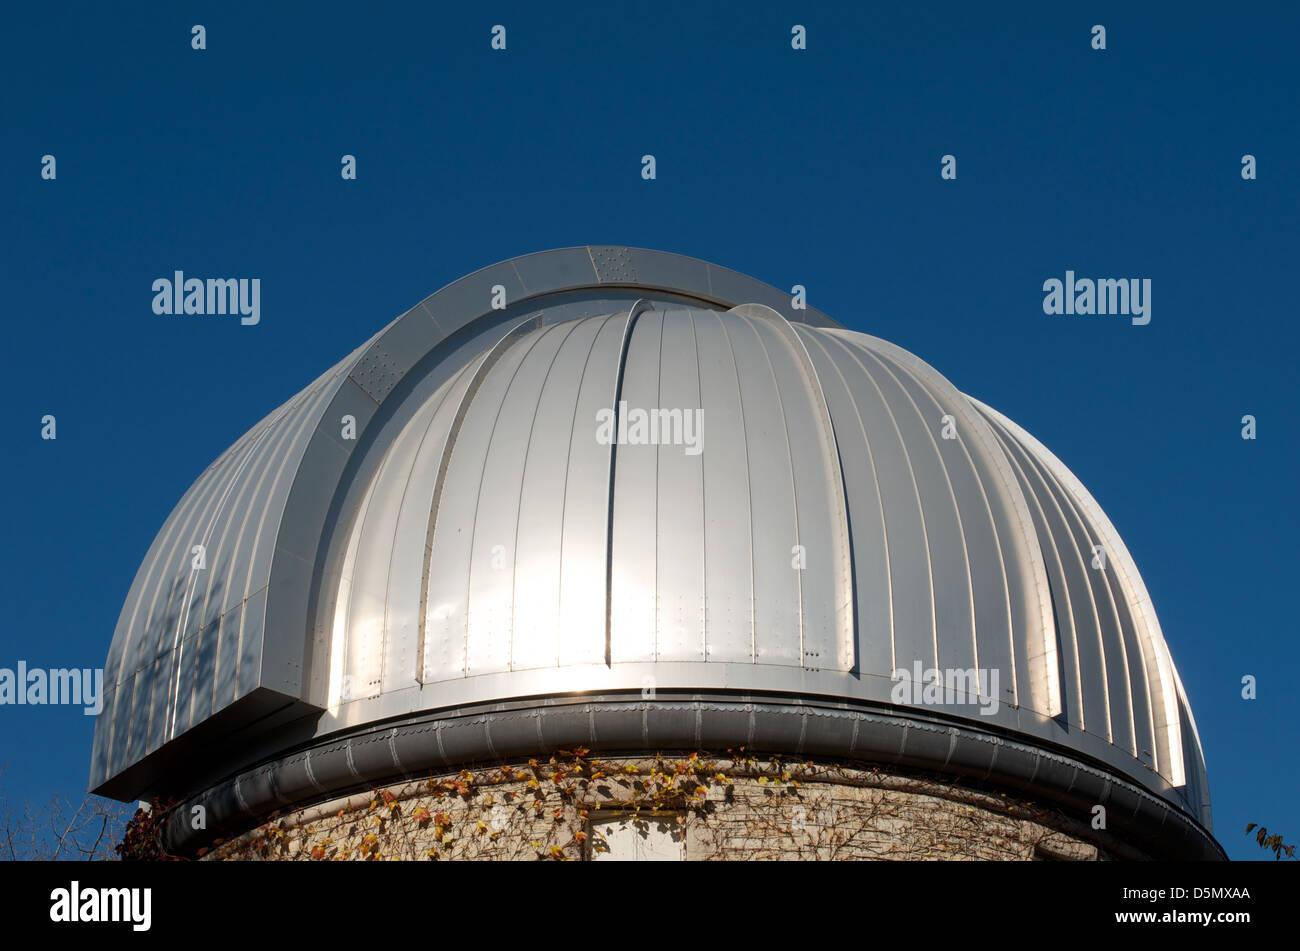 Stargazing Telescope Stock Photos & Stargazing Telescope Stock